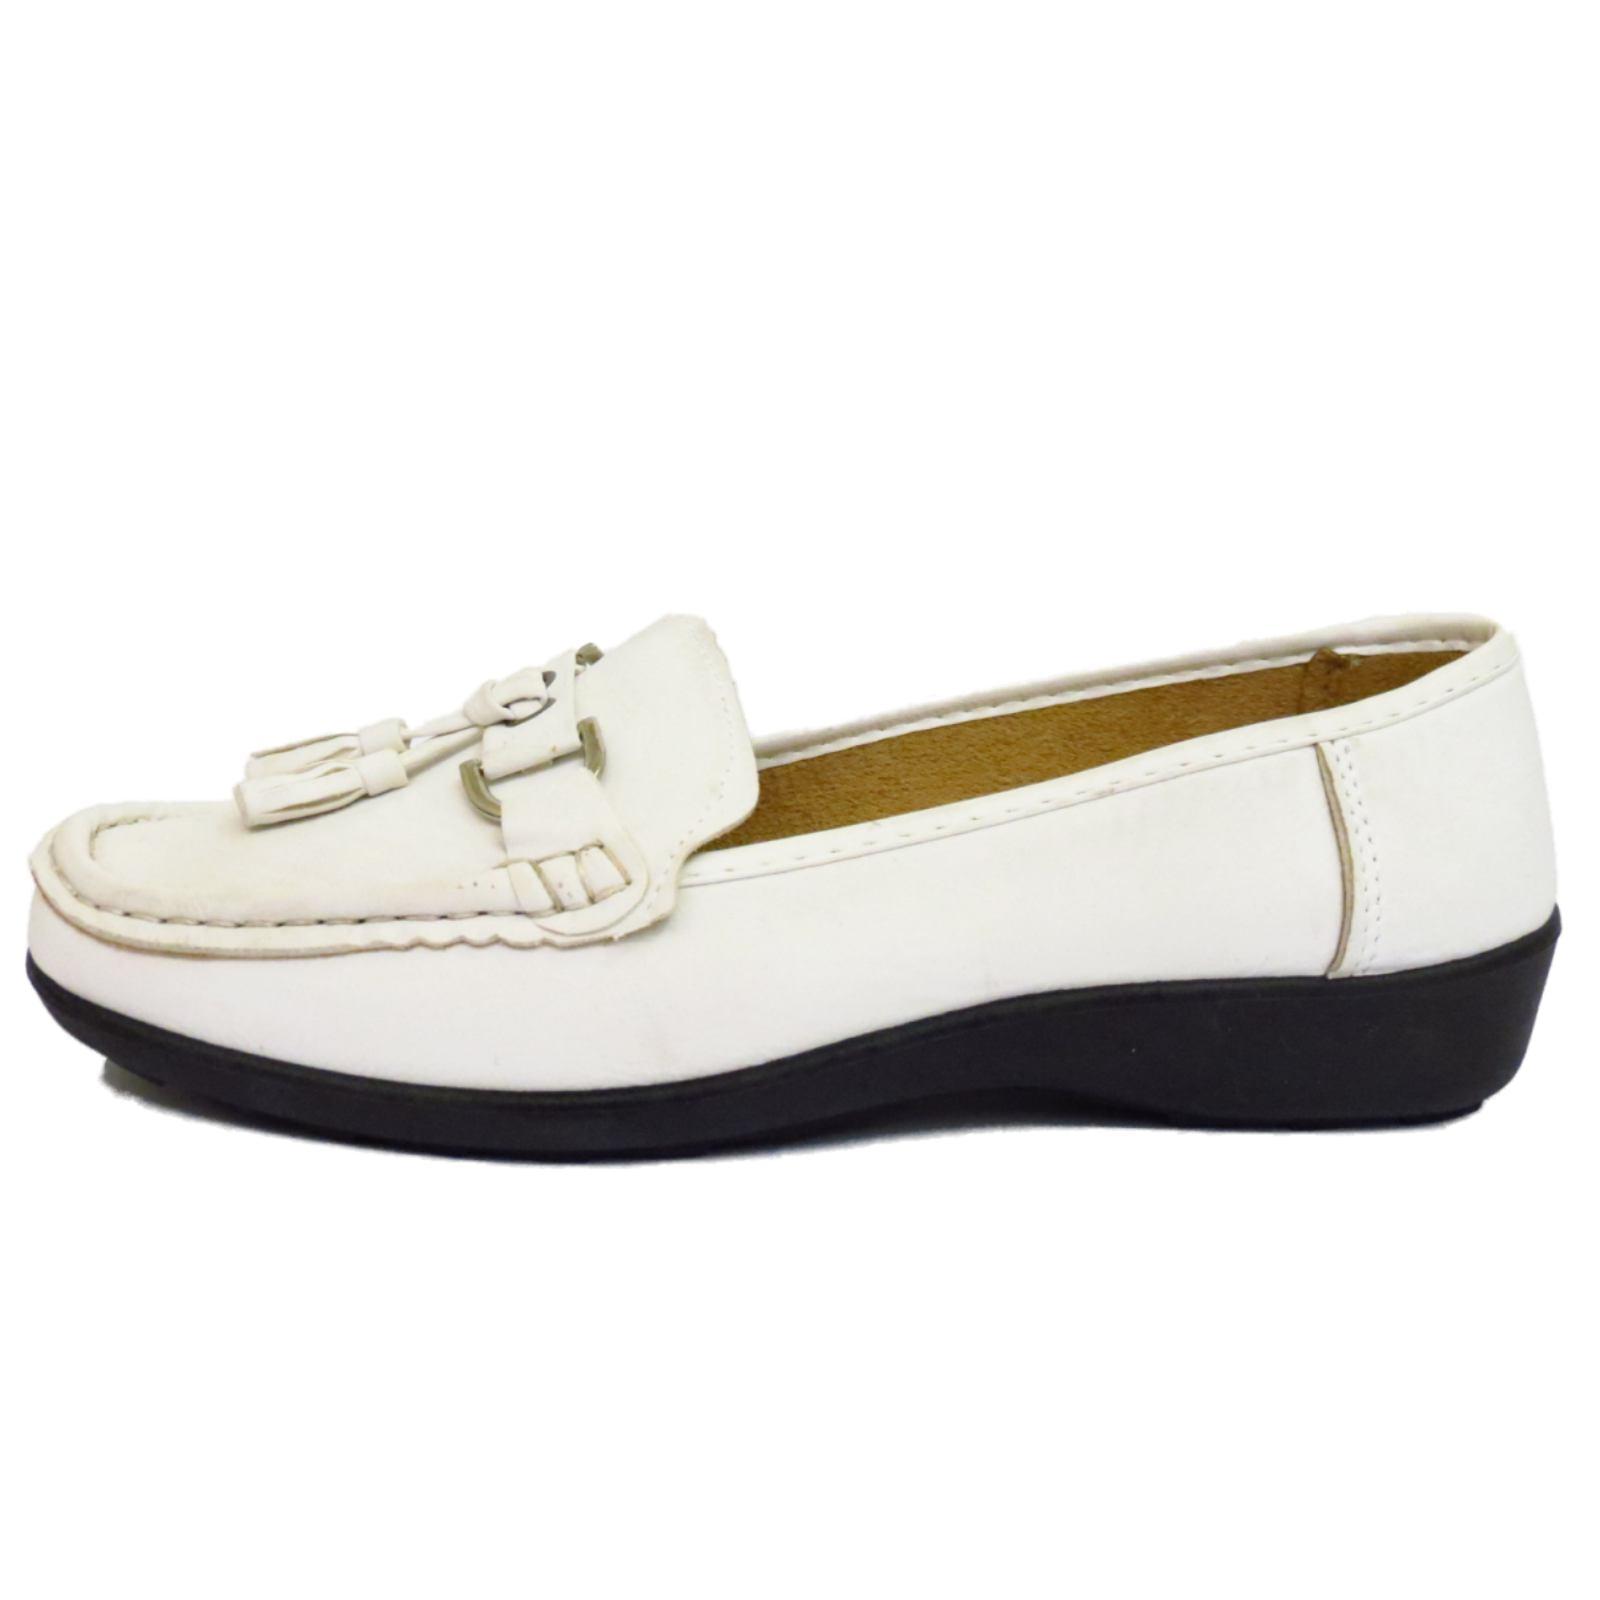 Womens Tassle Loafers Shoe Size